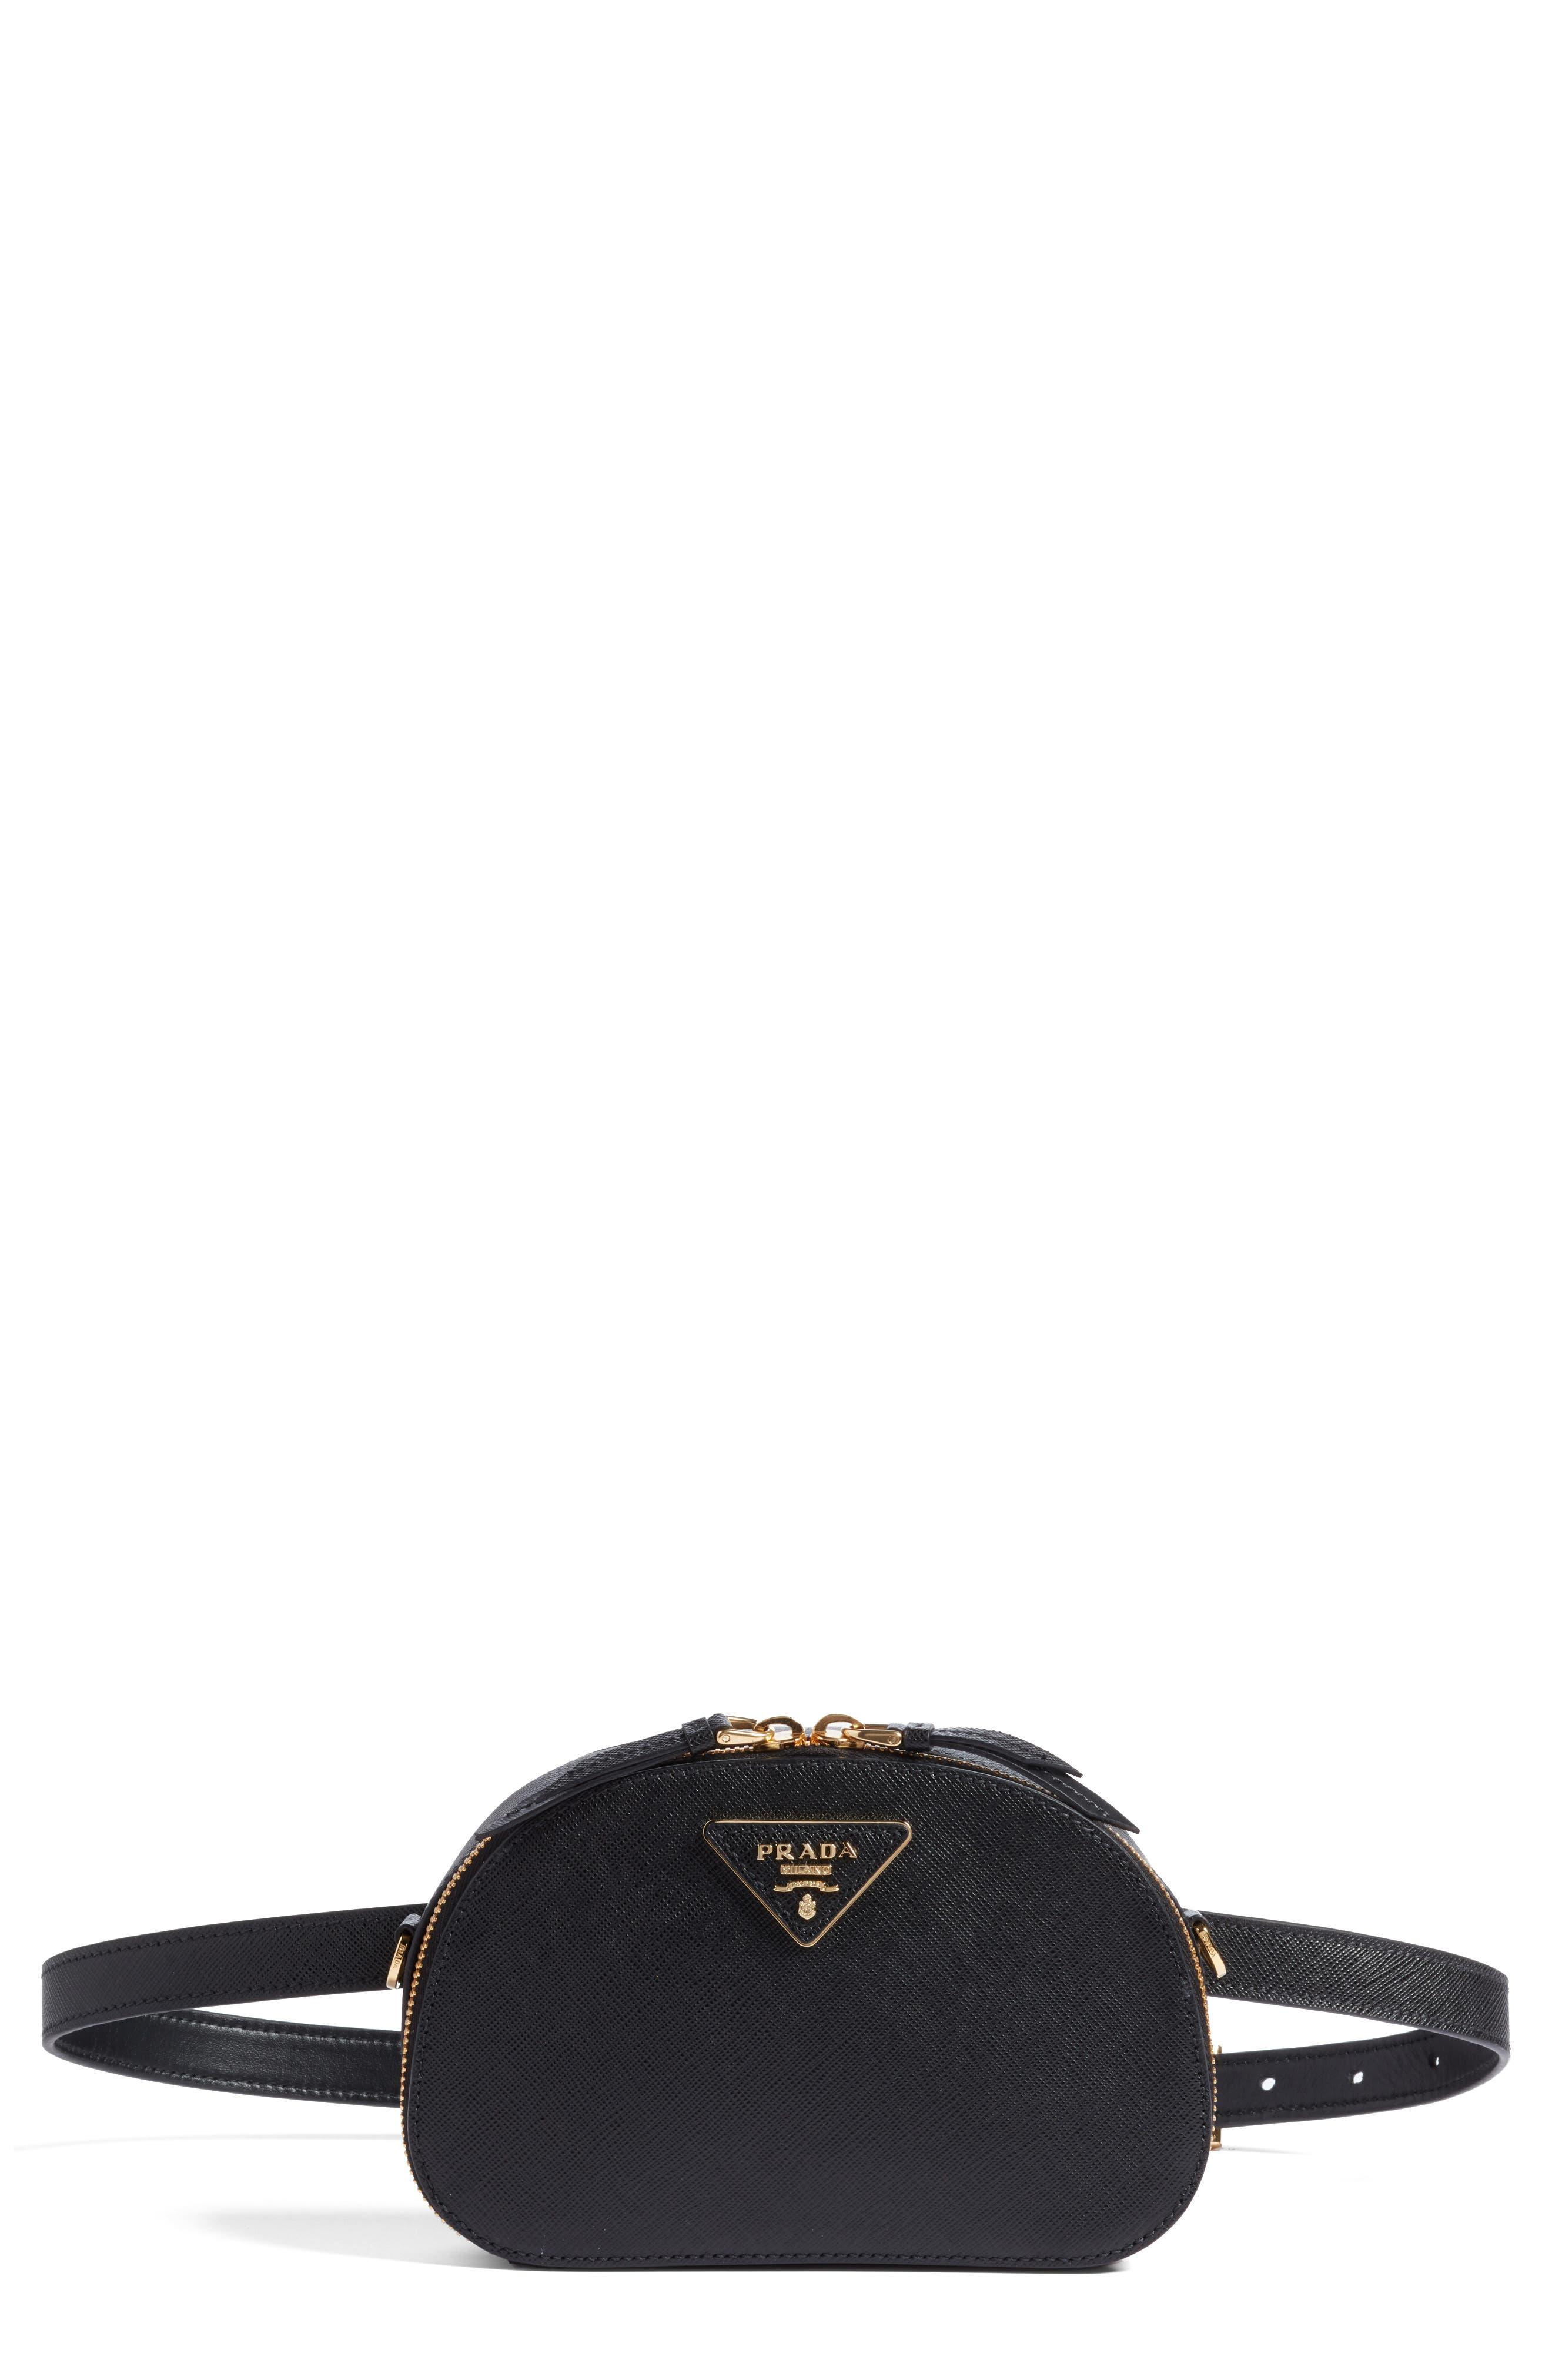 PRADA, Saffiano Leather Belt Bag, Main thumbnail 1, color, 001